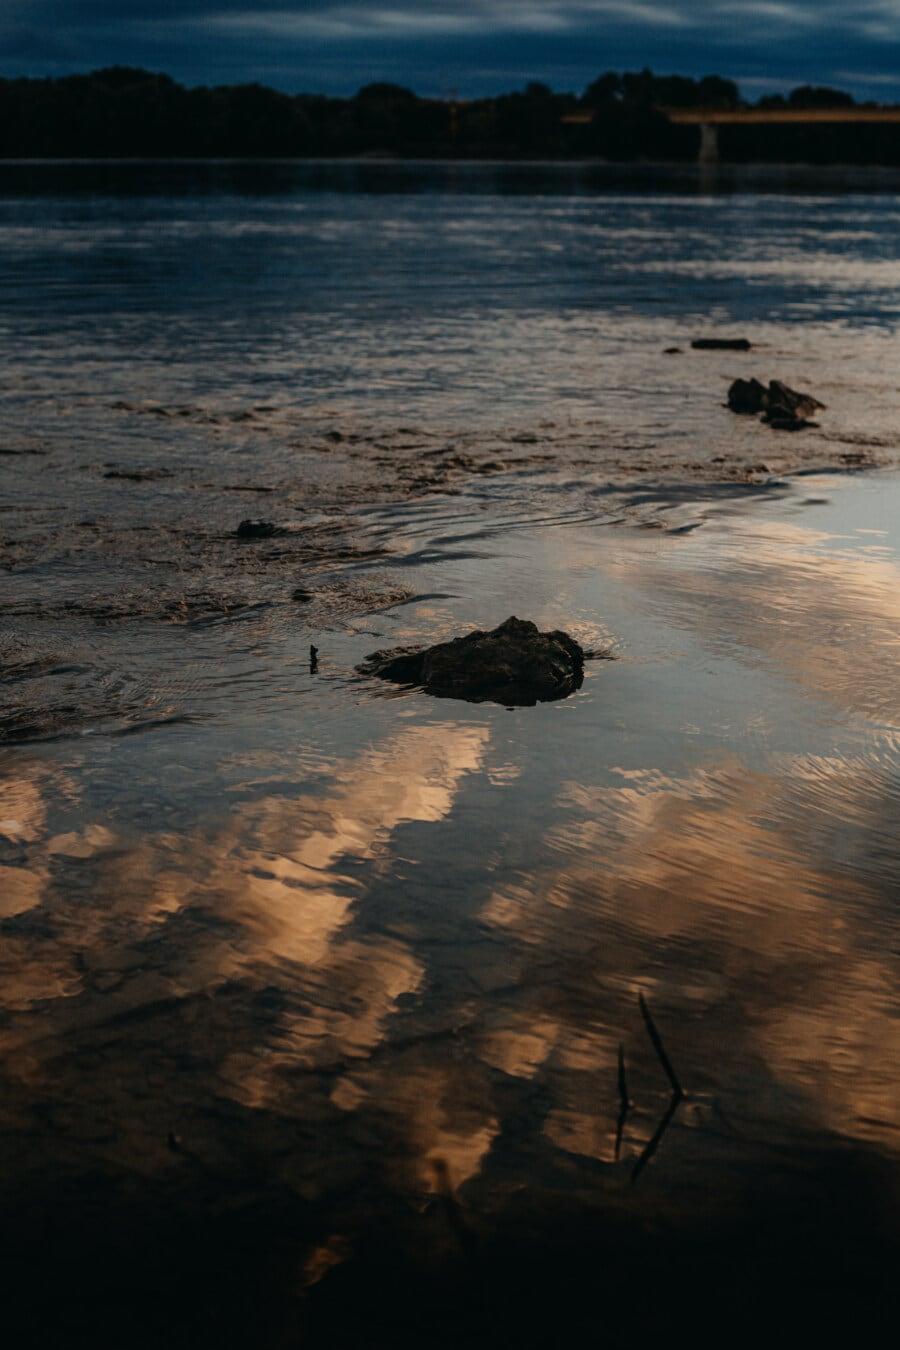 reflection, night, riverbank, tide, tide water, twilight, sand, sunset, beach, water